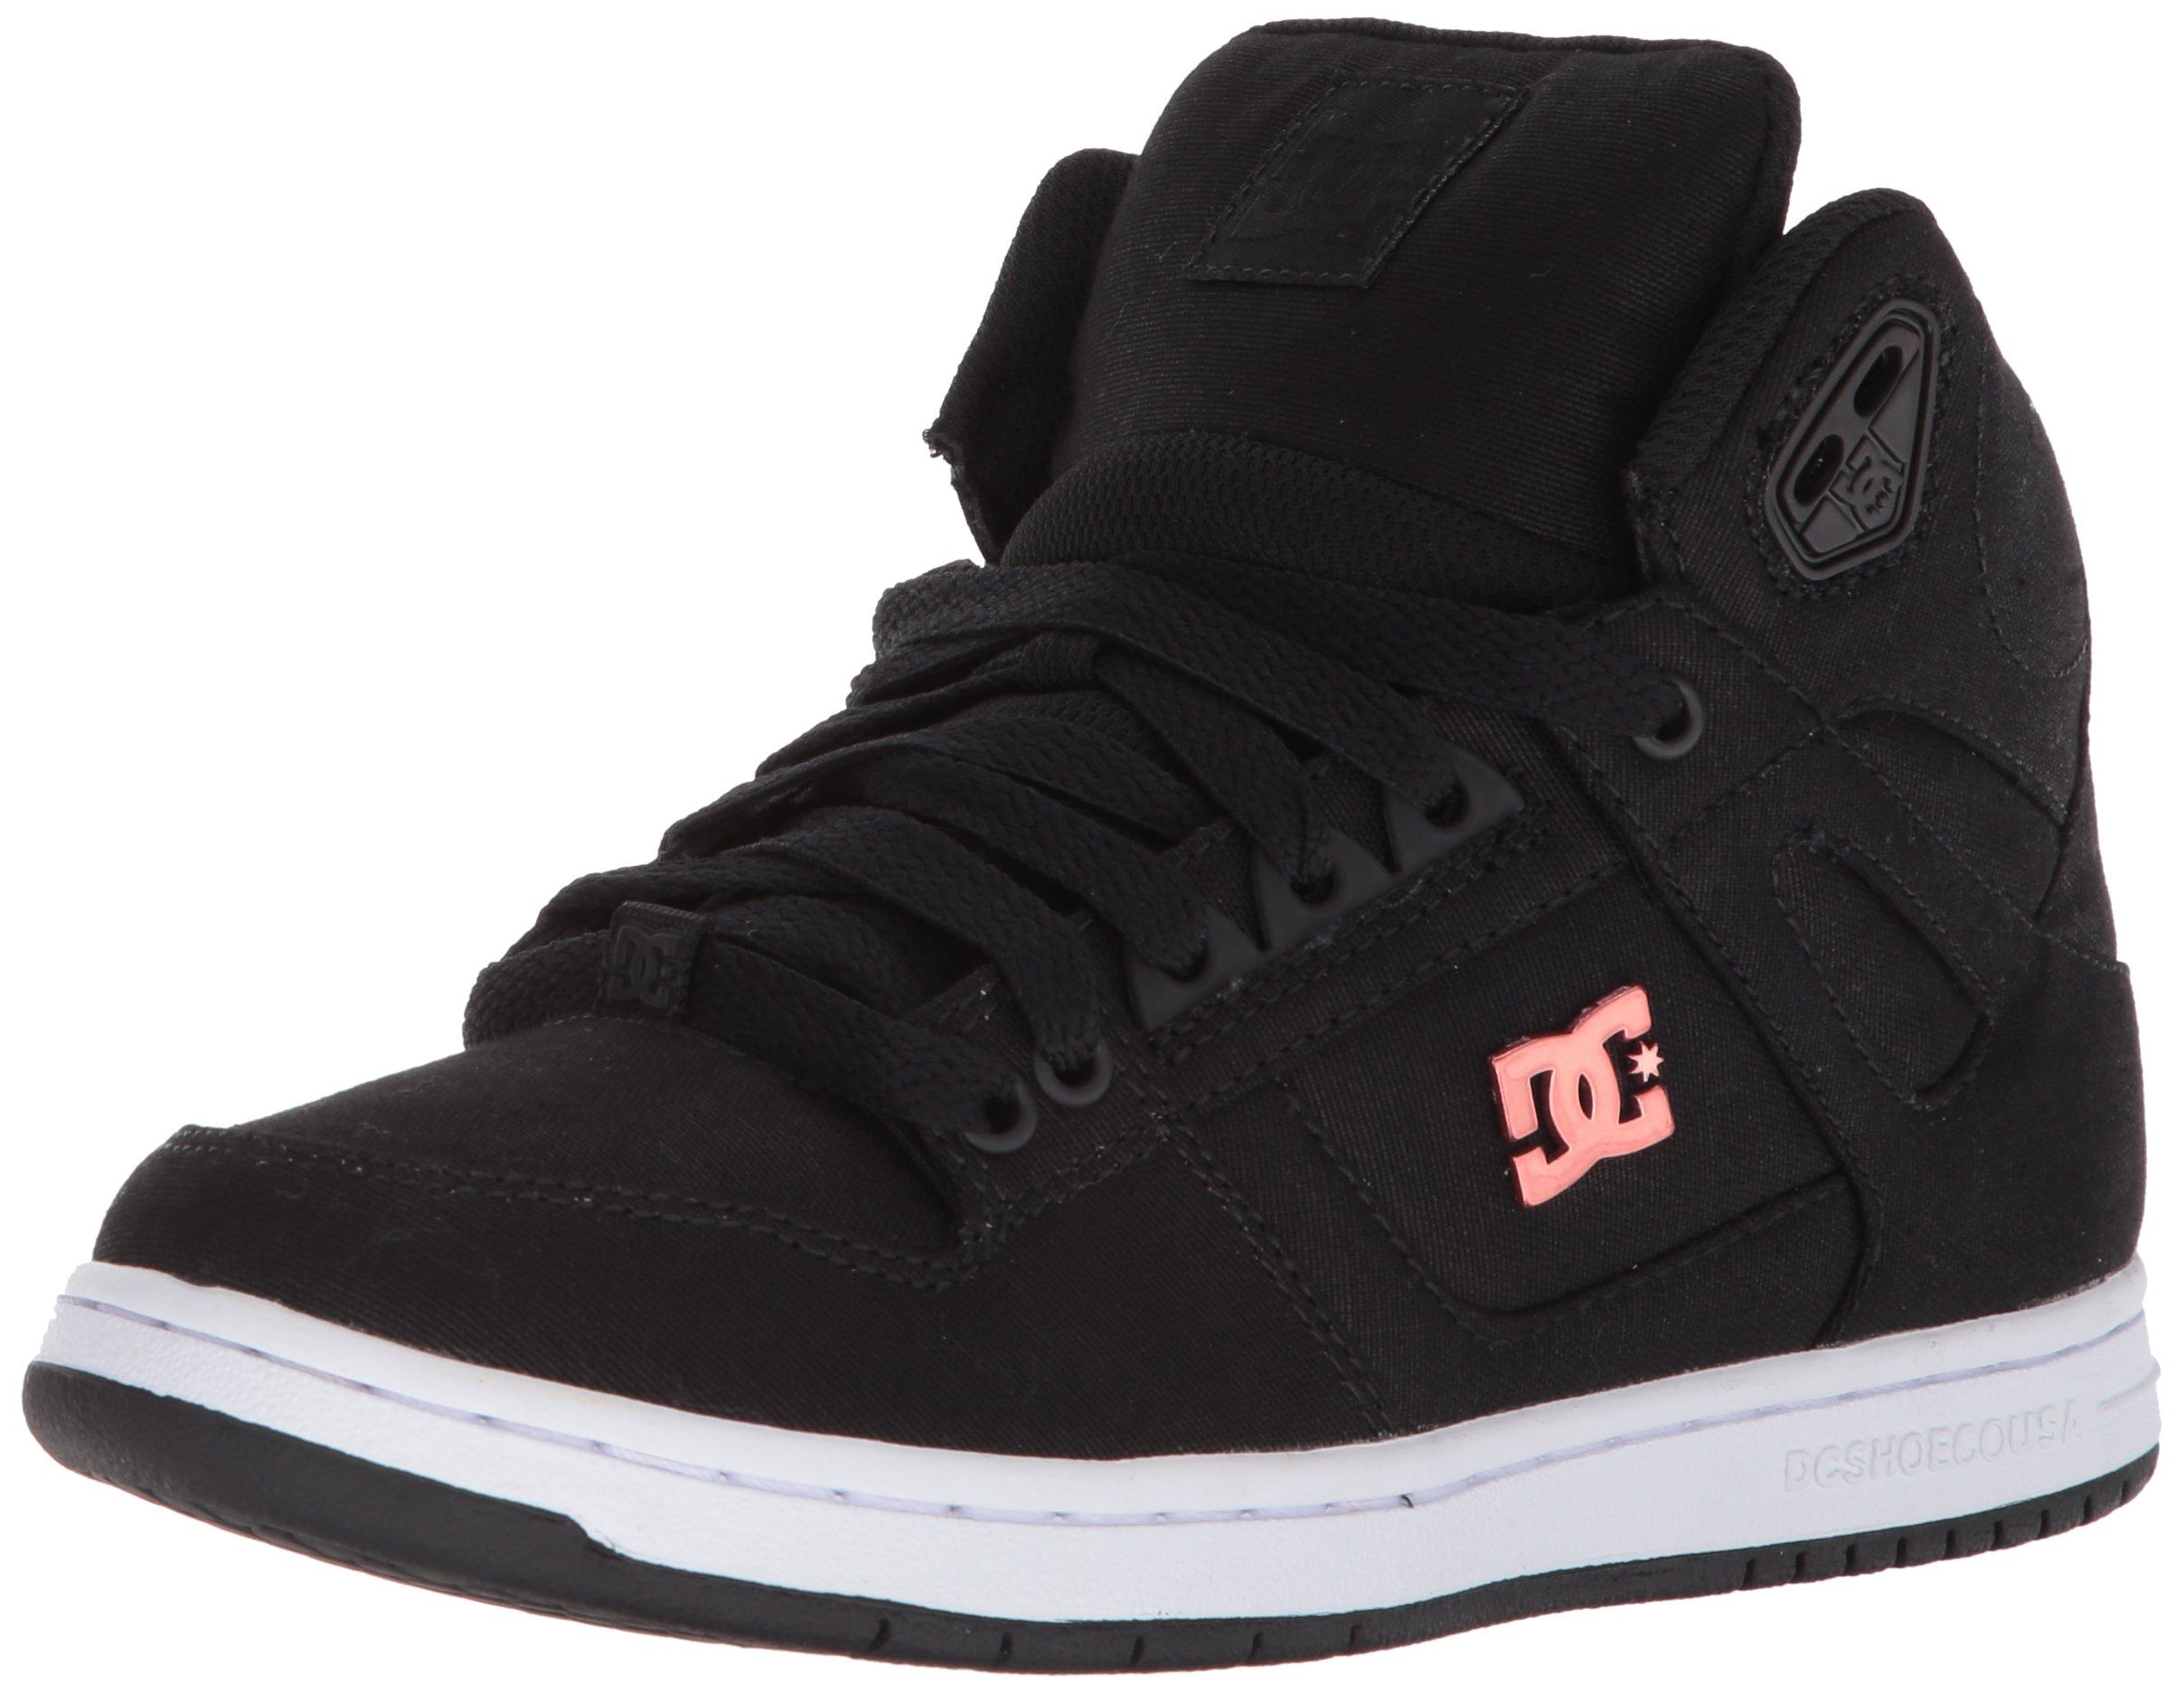 DC Women's Pure High-Top TX SE Skate Shoe, Black/Black/White, 7 B US